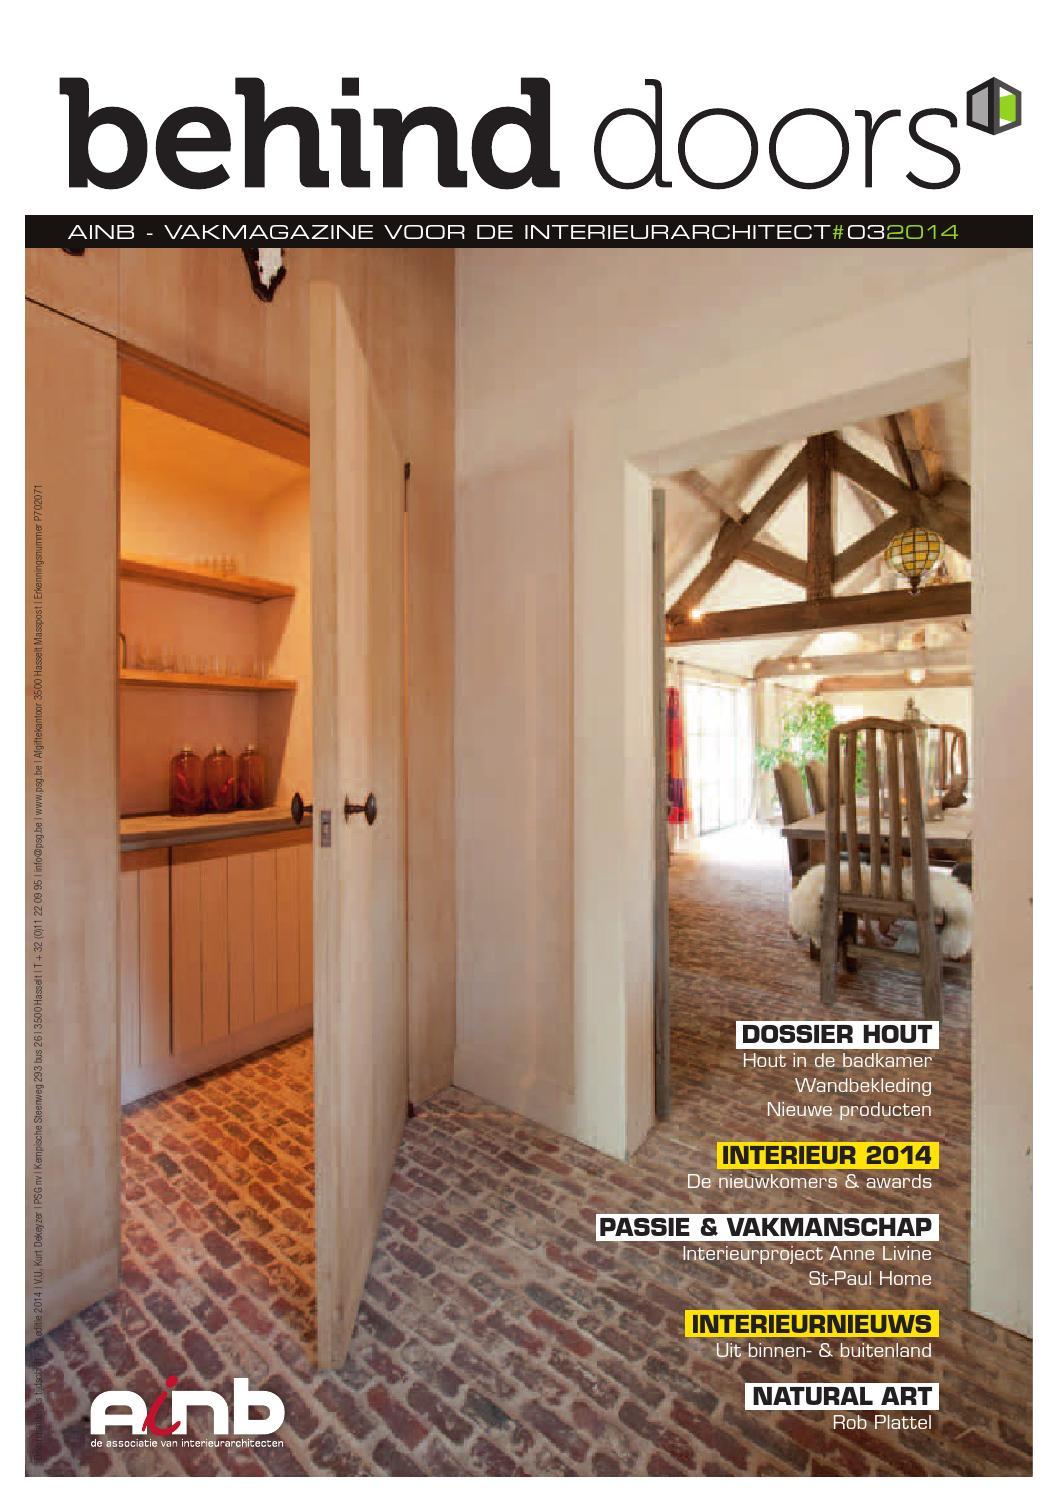 behinddoors03-2014 by AiNB - issuu